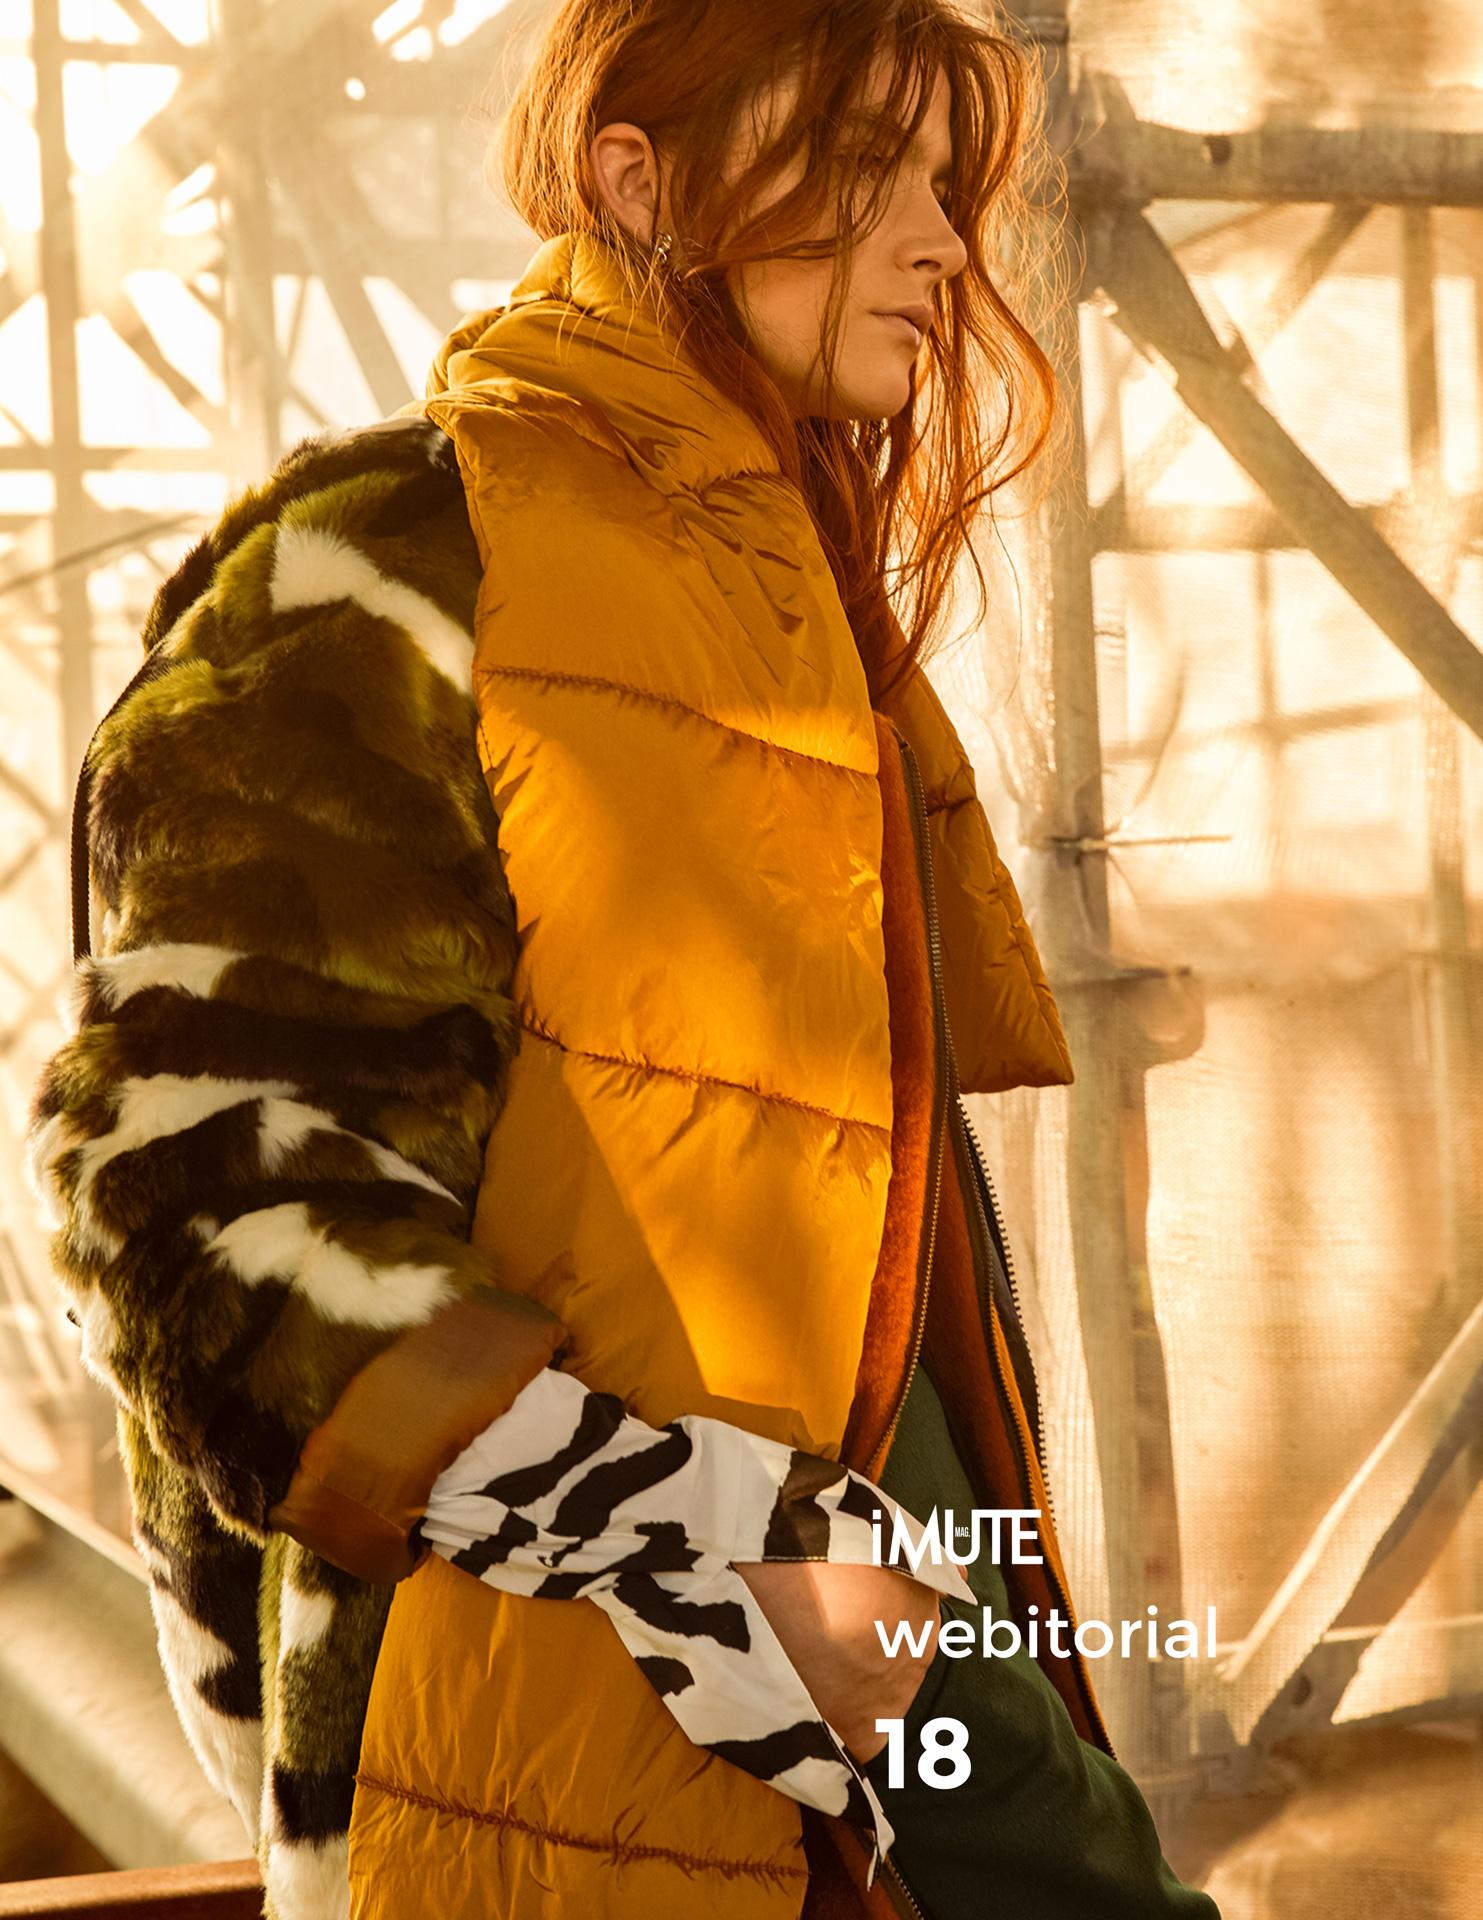 The New Nomad webitorial for iMute Magazine Photographer|Myrthe Giesbers Art Director|Xana Harmsen Model| Niekee Bohne @Paparazzi Models Stylist| Brea Mulder Makeup|Mariska Virginia van Kasbergen Hair|Latoya Velberg Makeup Assistant|Romee Stapel Hair Assistant|Nathalie Cairo